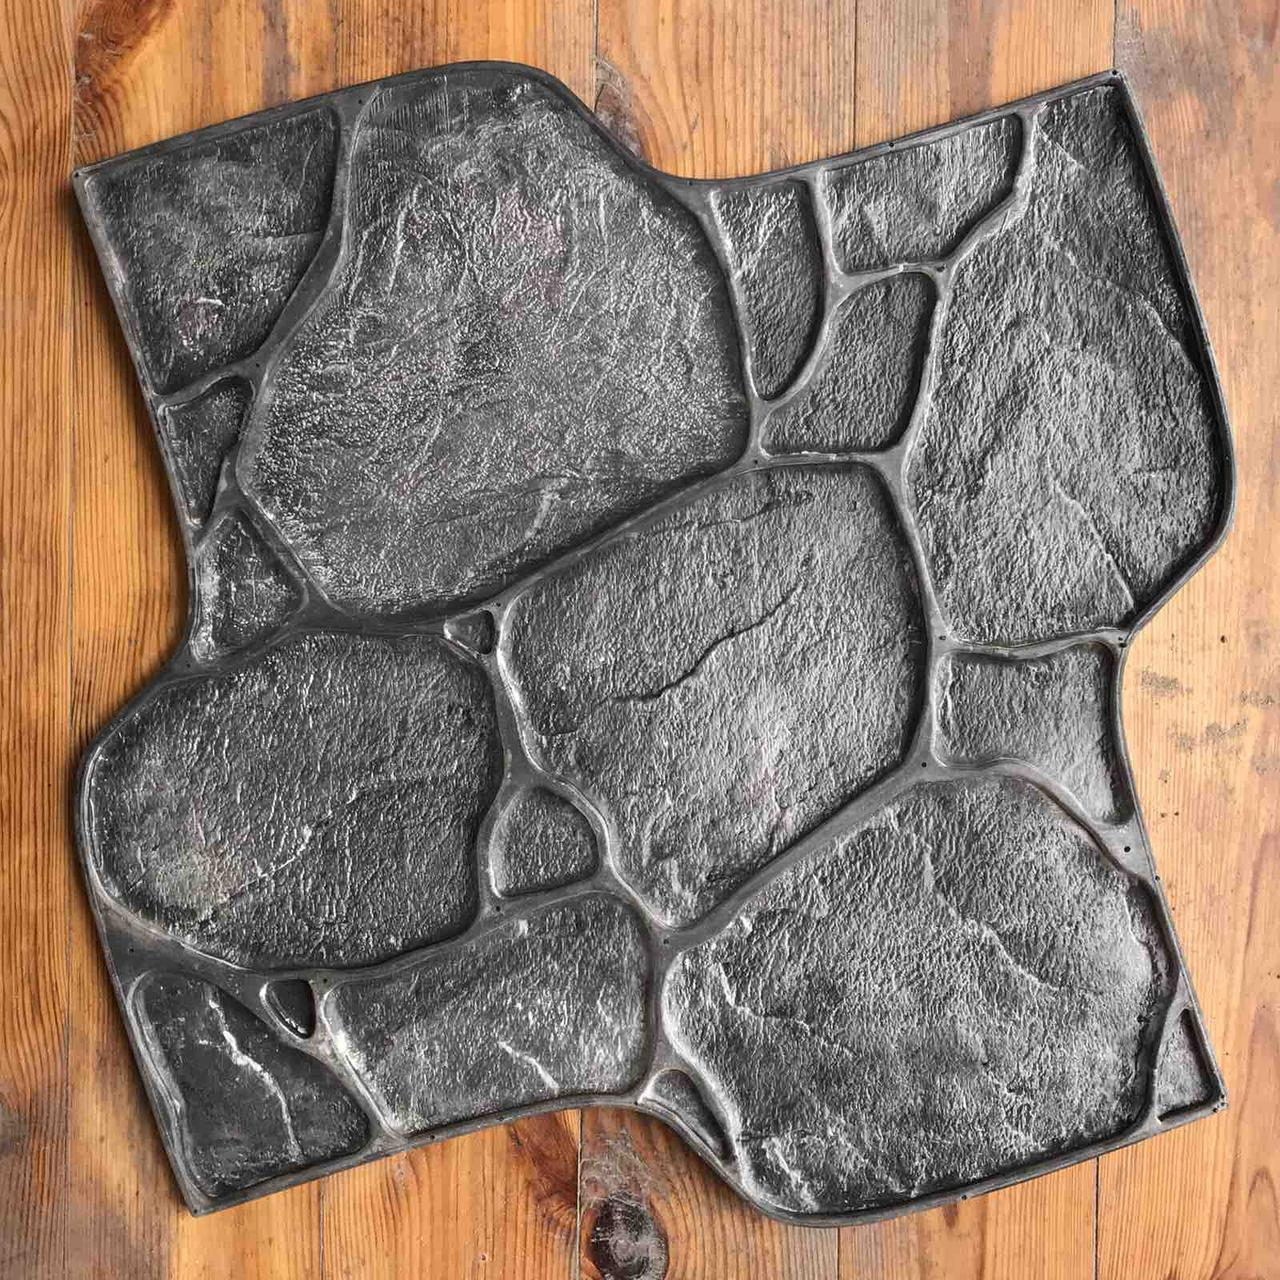 Декоративный бетон купить штампы чаплыгин бетон